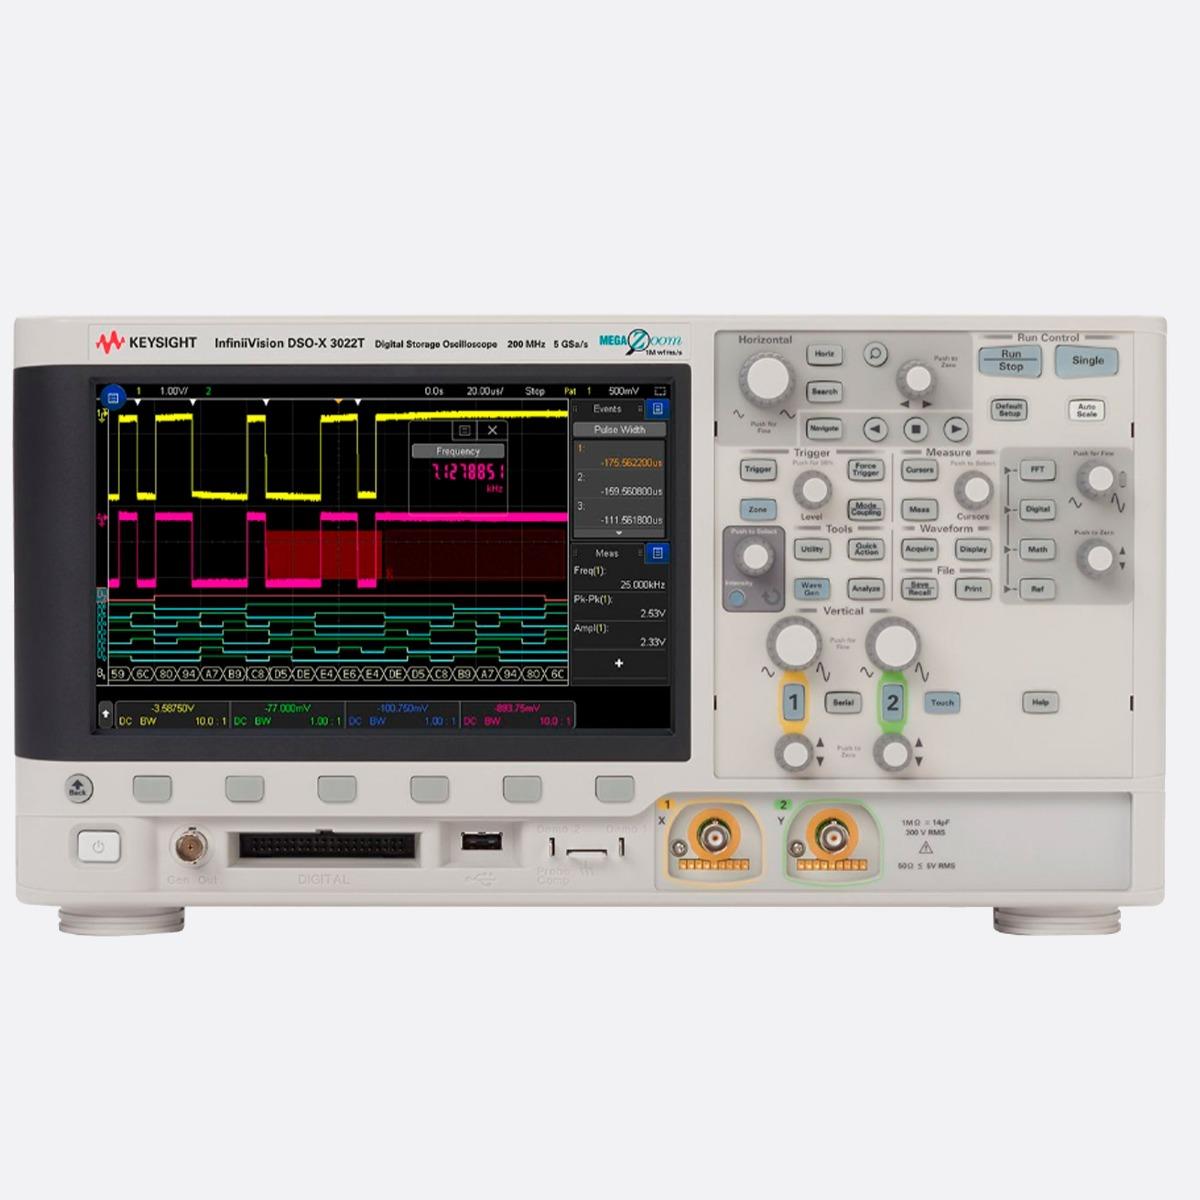 Keysight_DSOX3022T_Front_Ccontrols